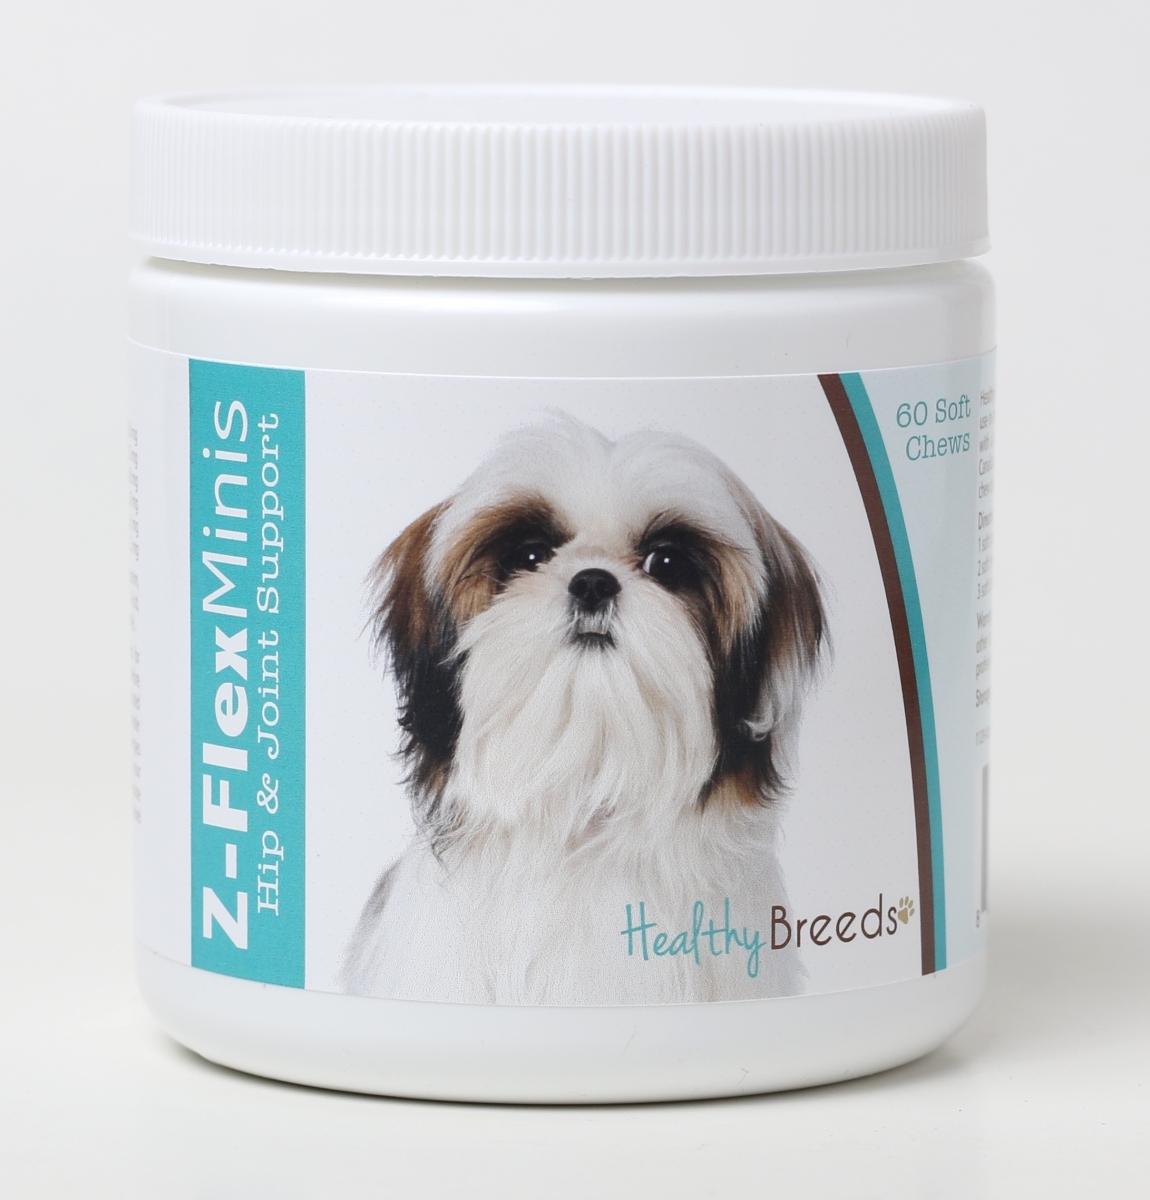 Healthy Breeds 840235115540 Shih Tzu Z-Flex Minis Hip & Joint Support Soft Chews 60 Count